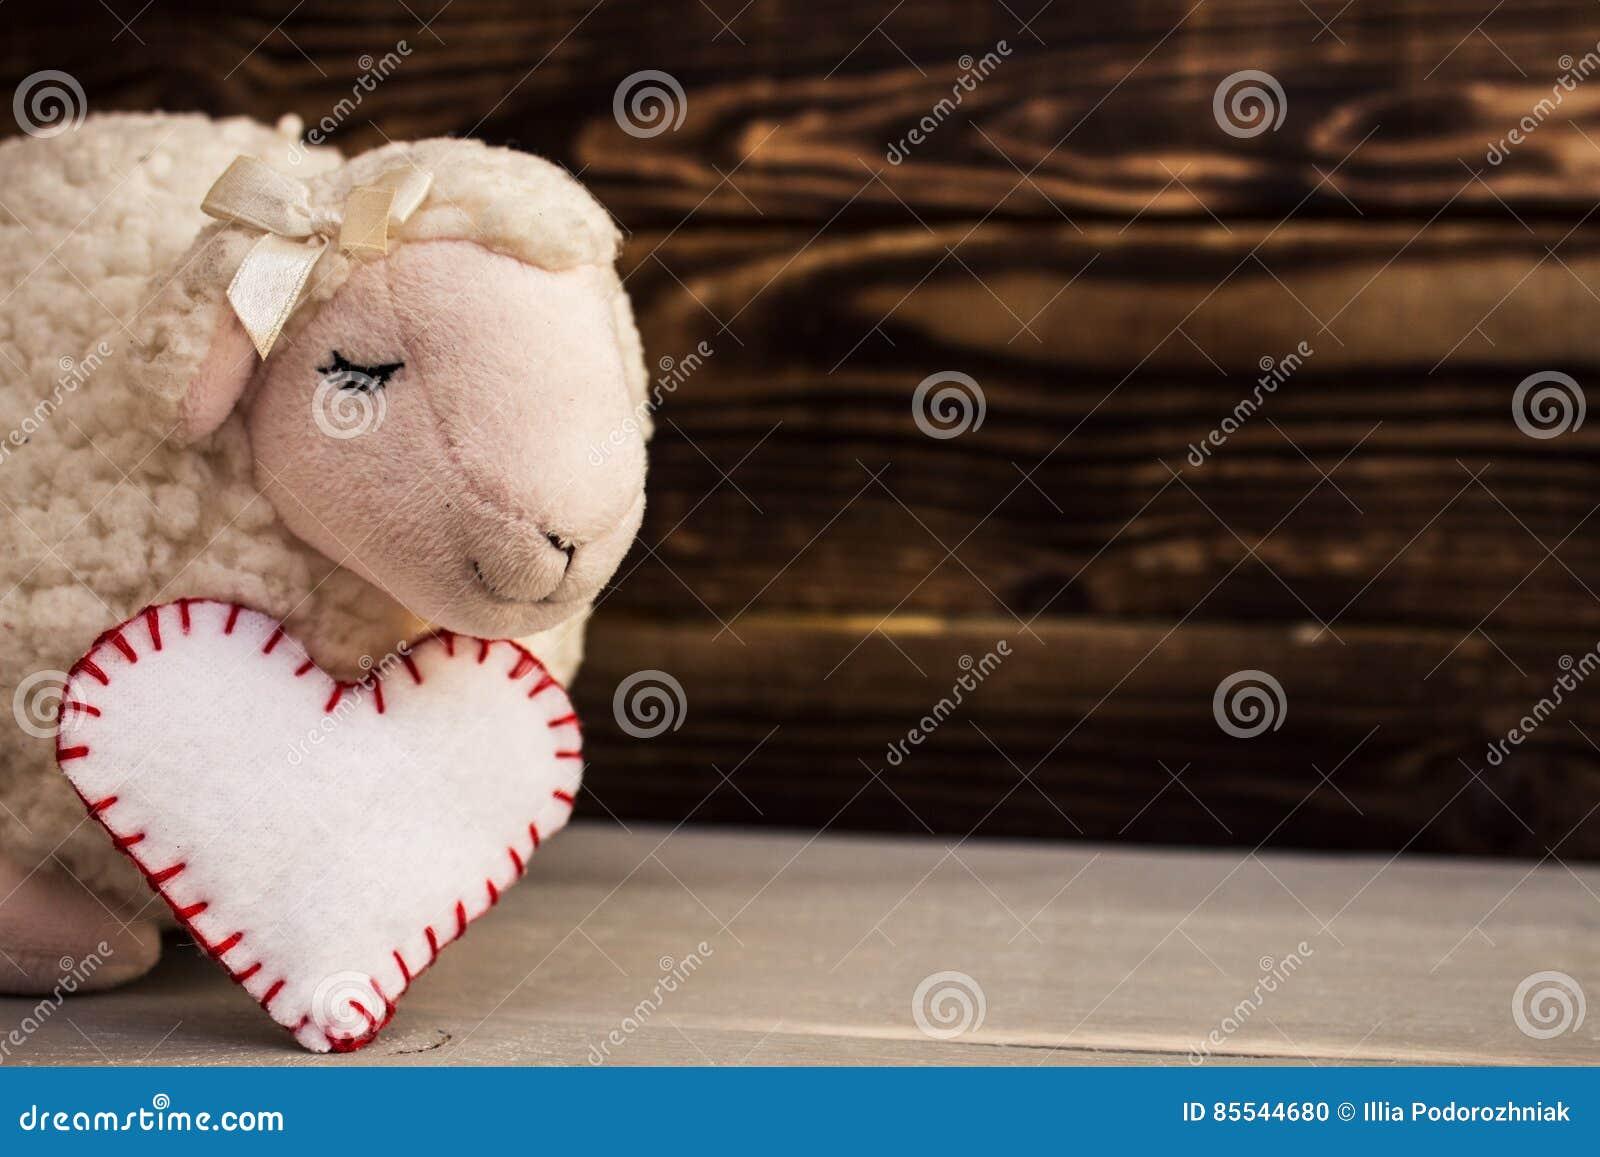 Toy lamb wood face desk